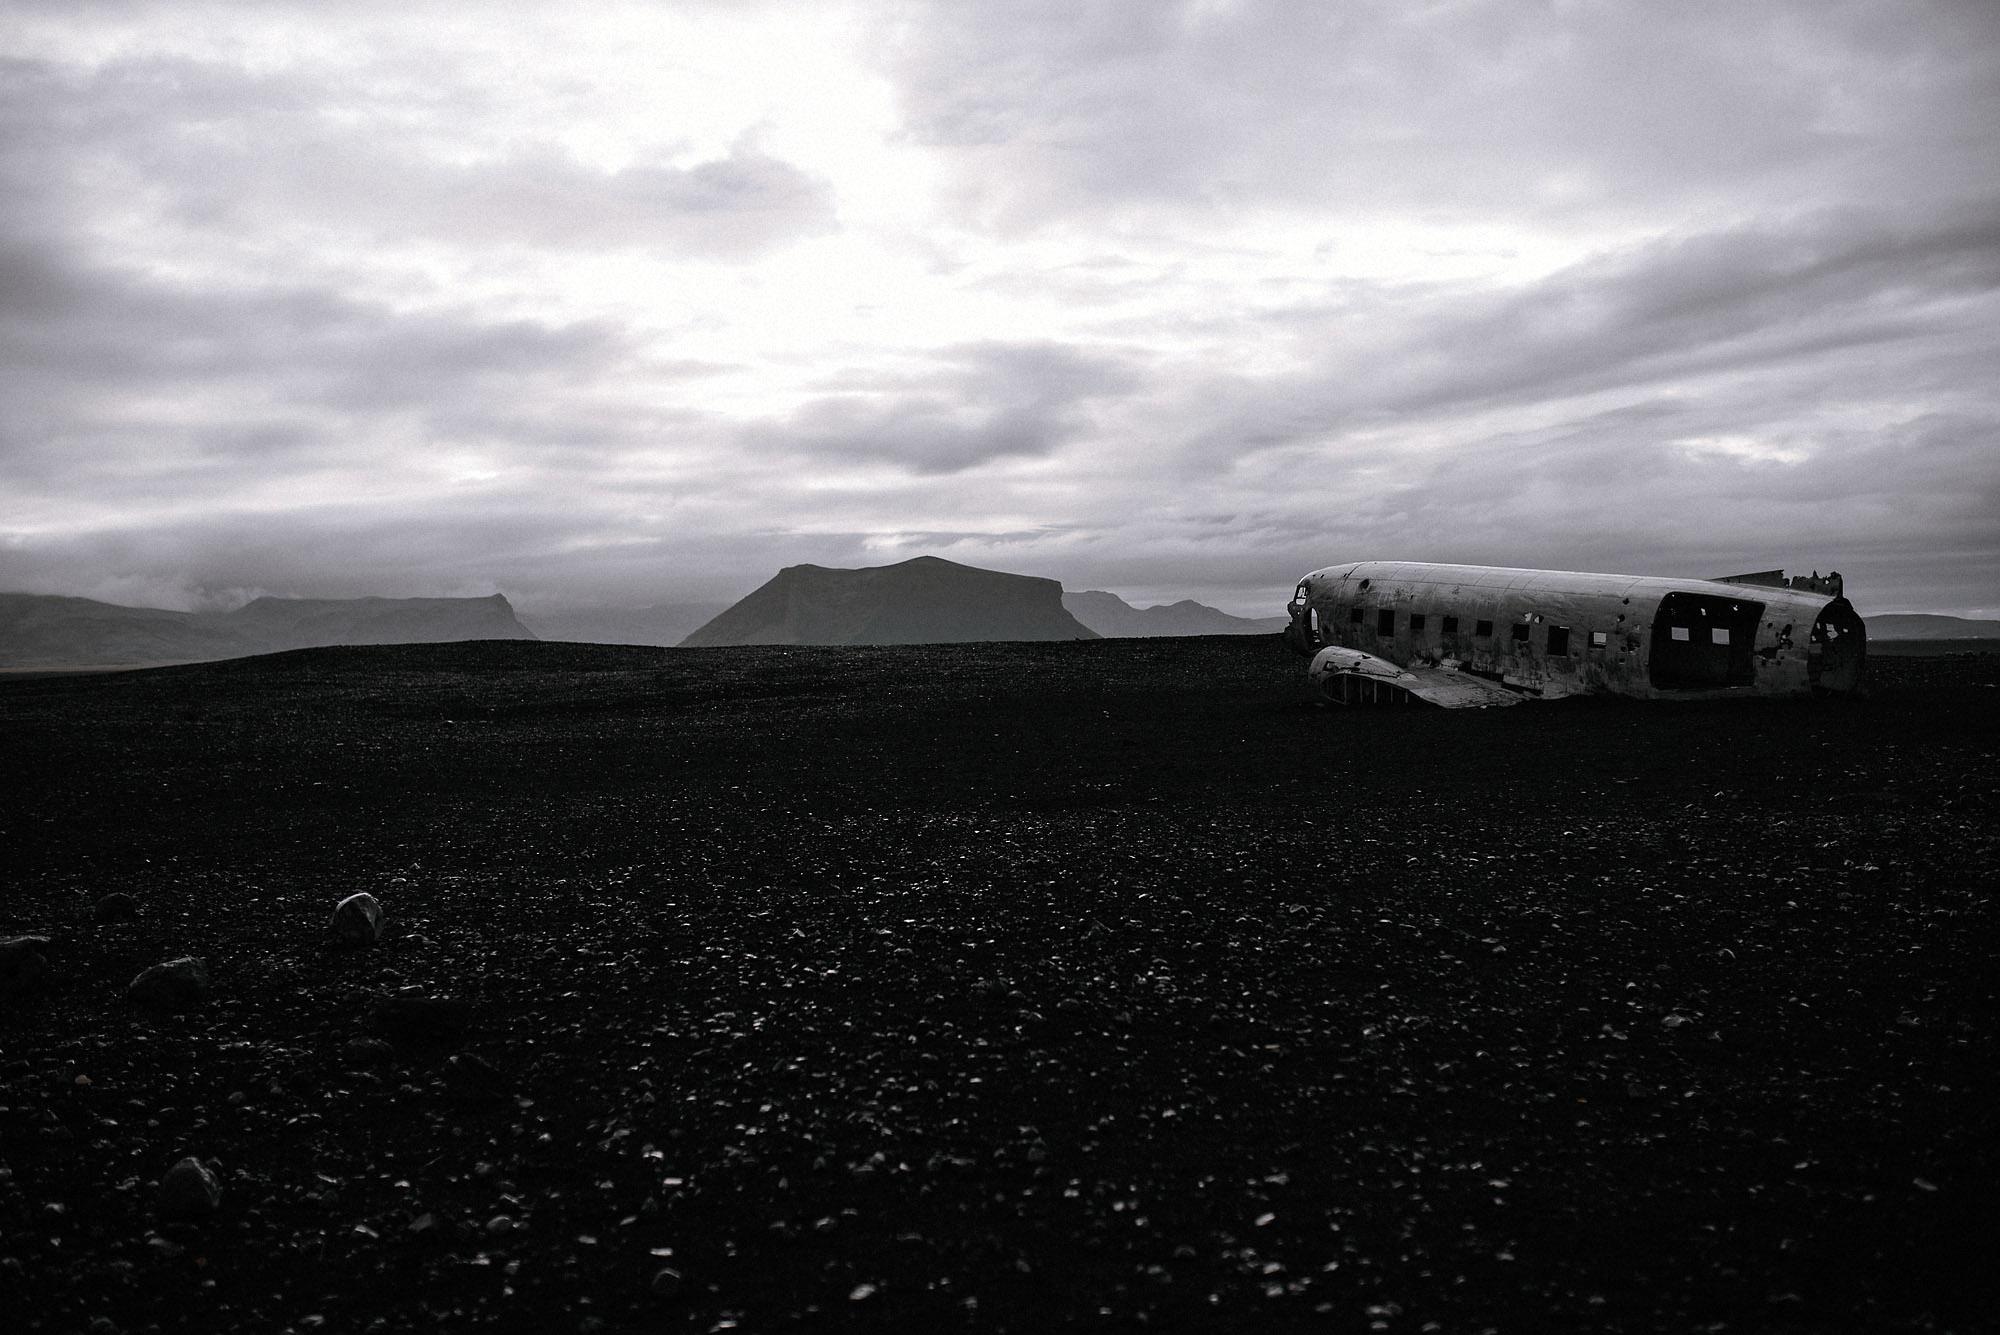 iceland-photographer-reykjavik-jere-satamo-1-web.jpg